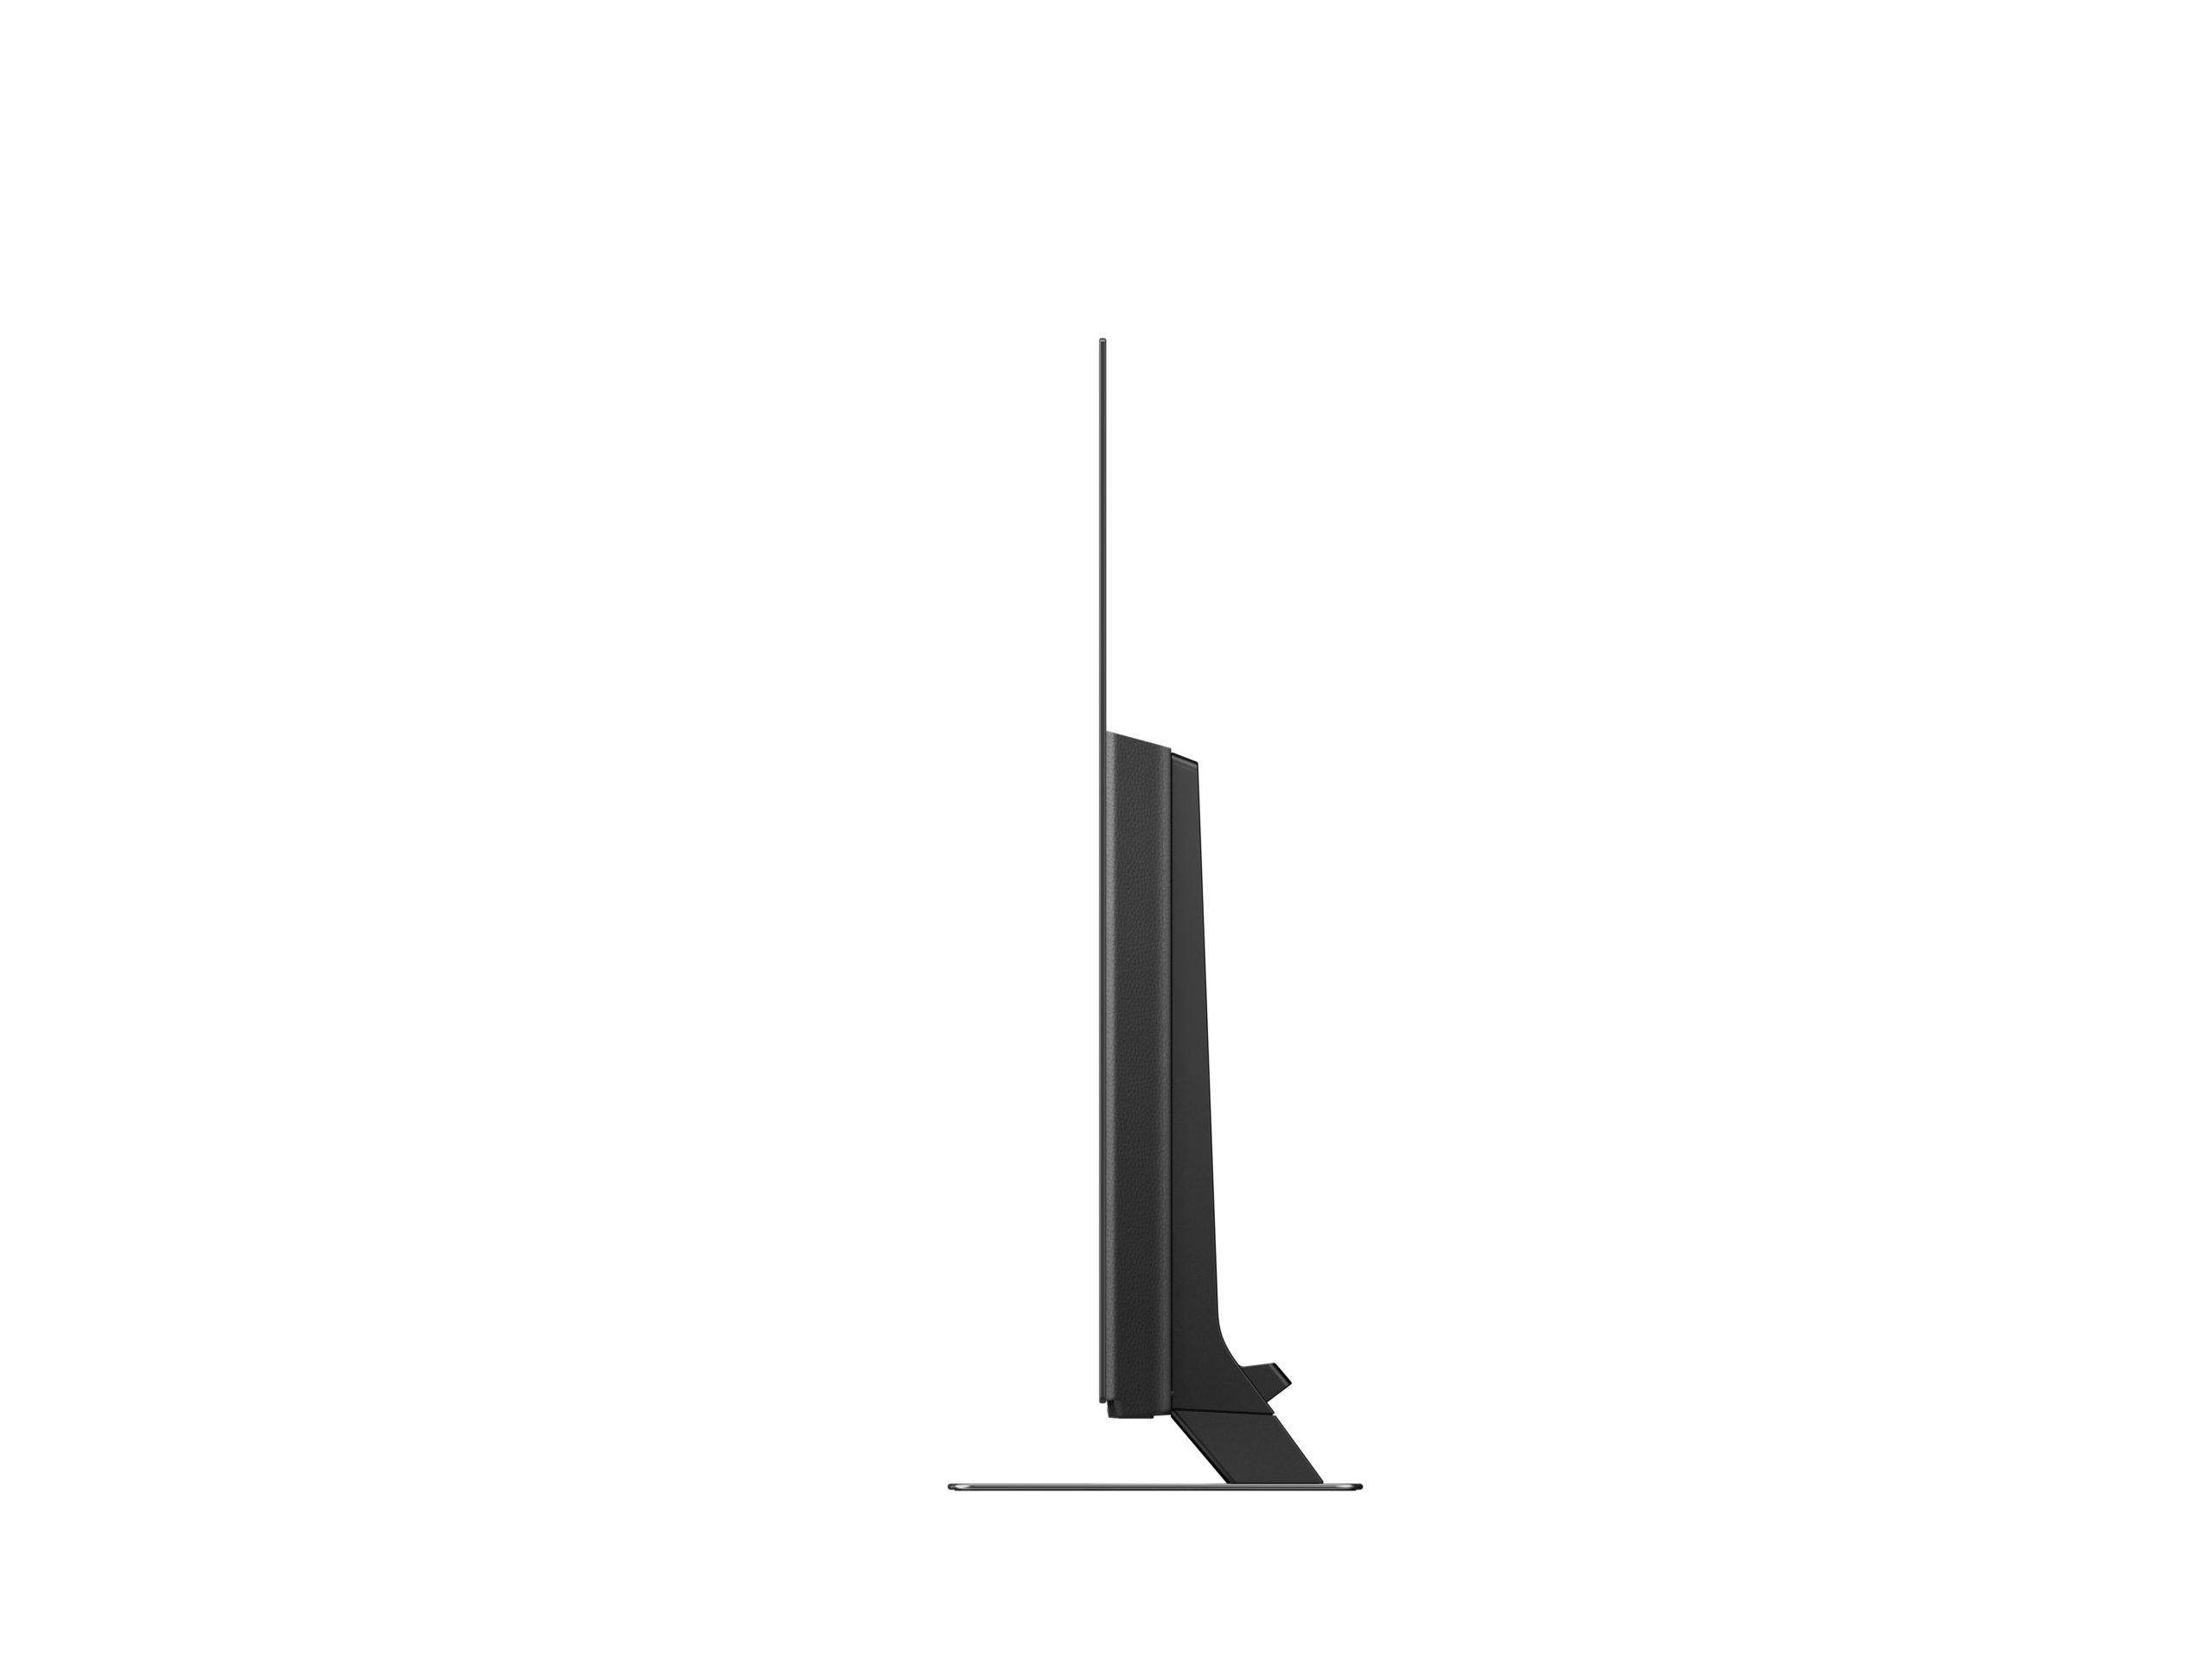 Panasonic TX 65EZ 950E profil scaled